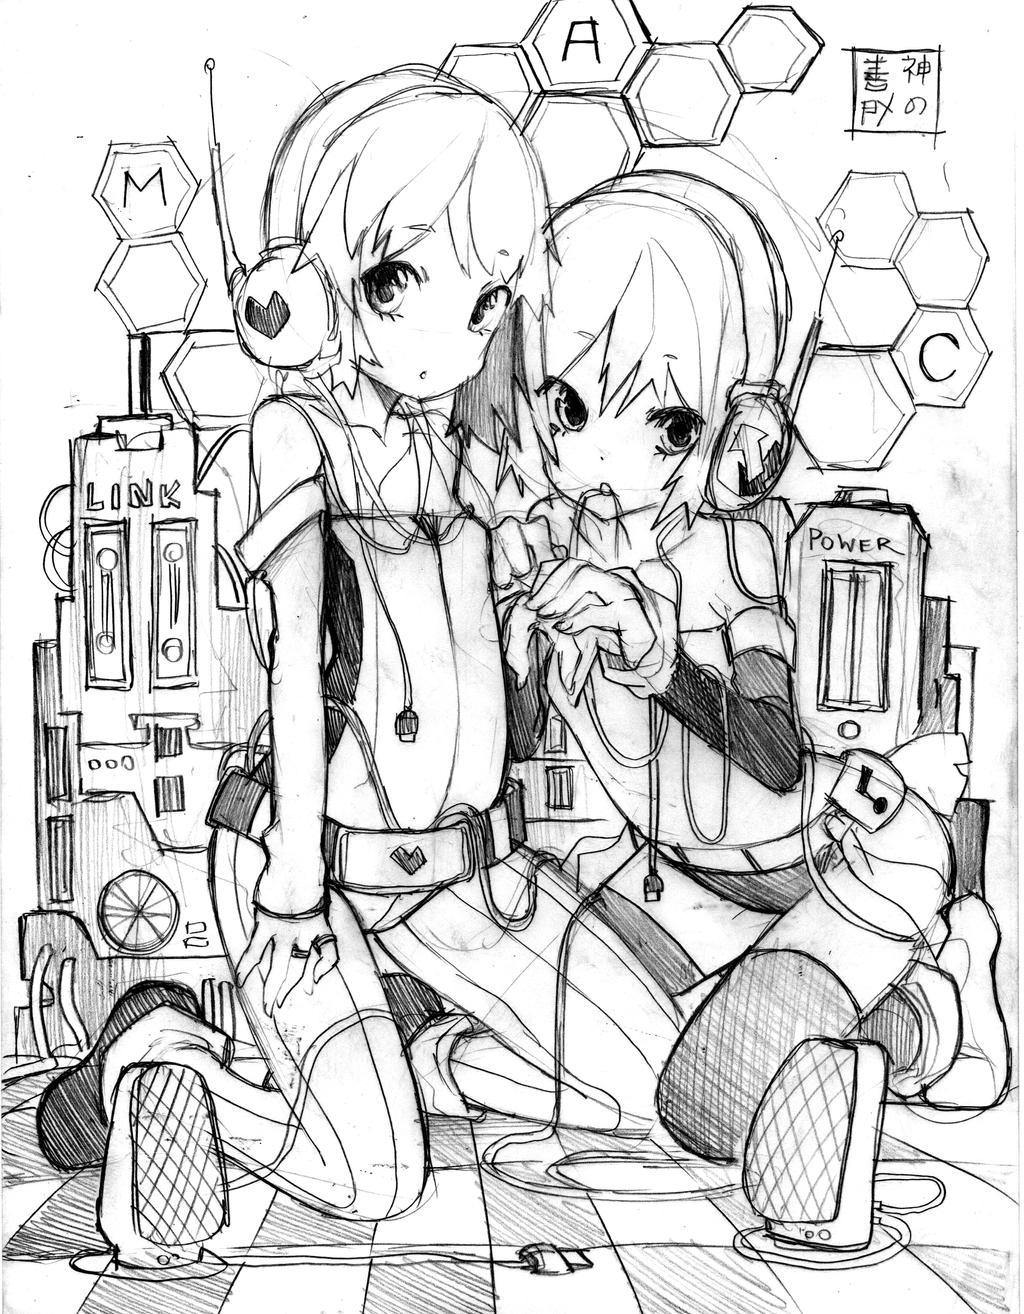 Loli Network Sketch by EUDETENIS